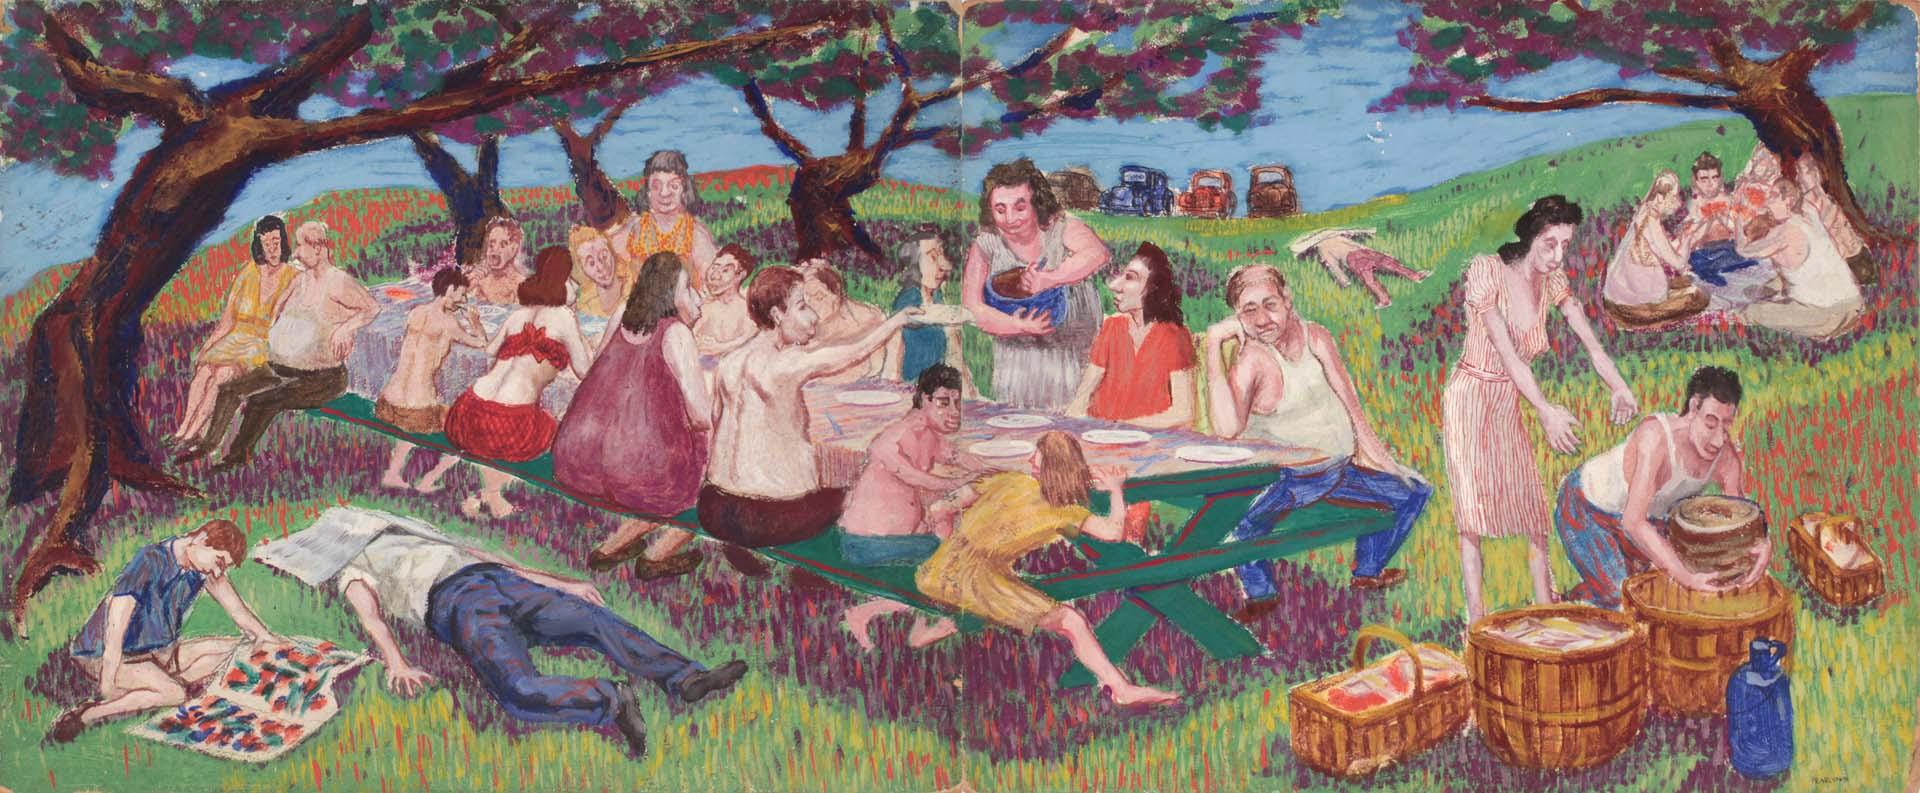 1948 Family Picnic (Caricature